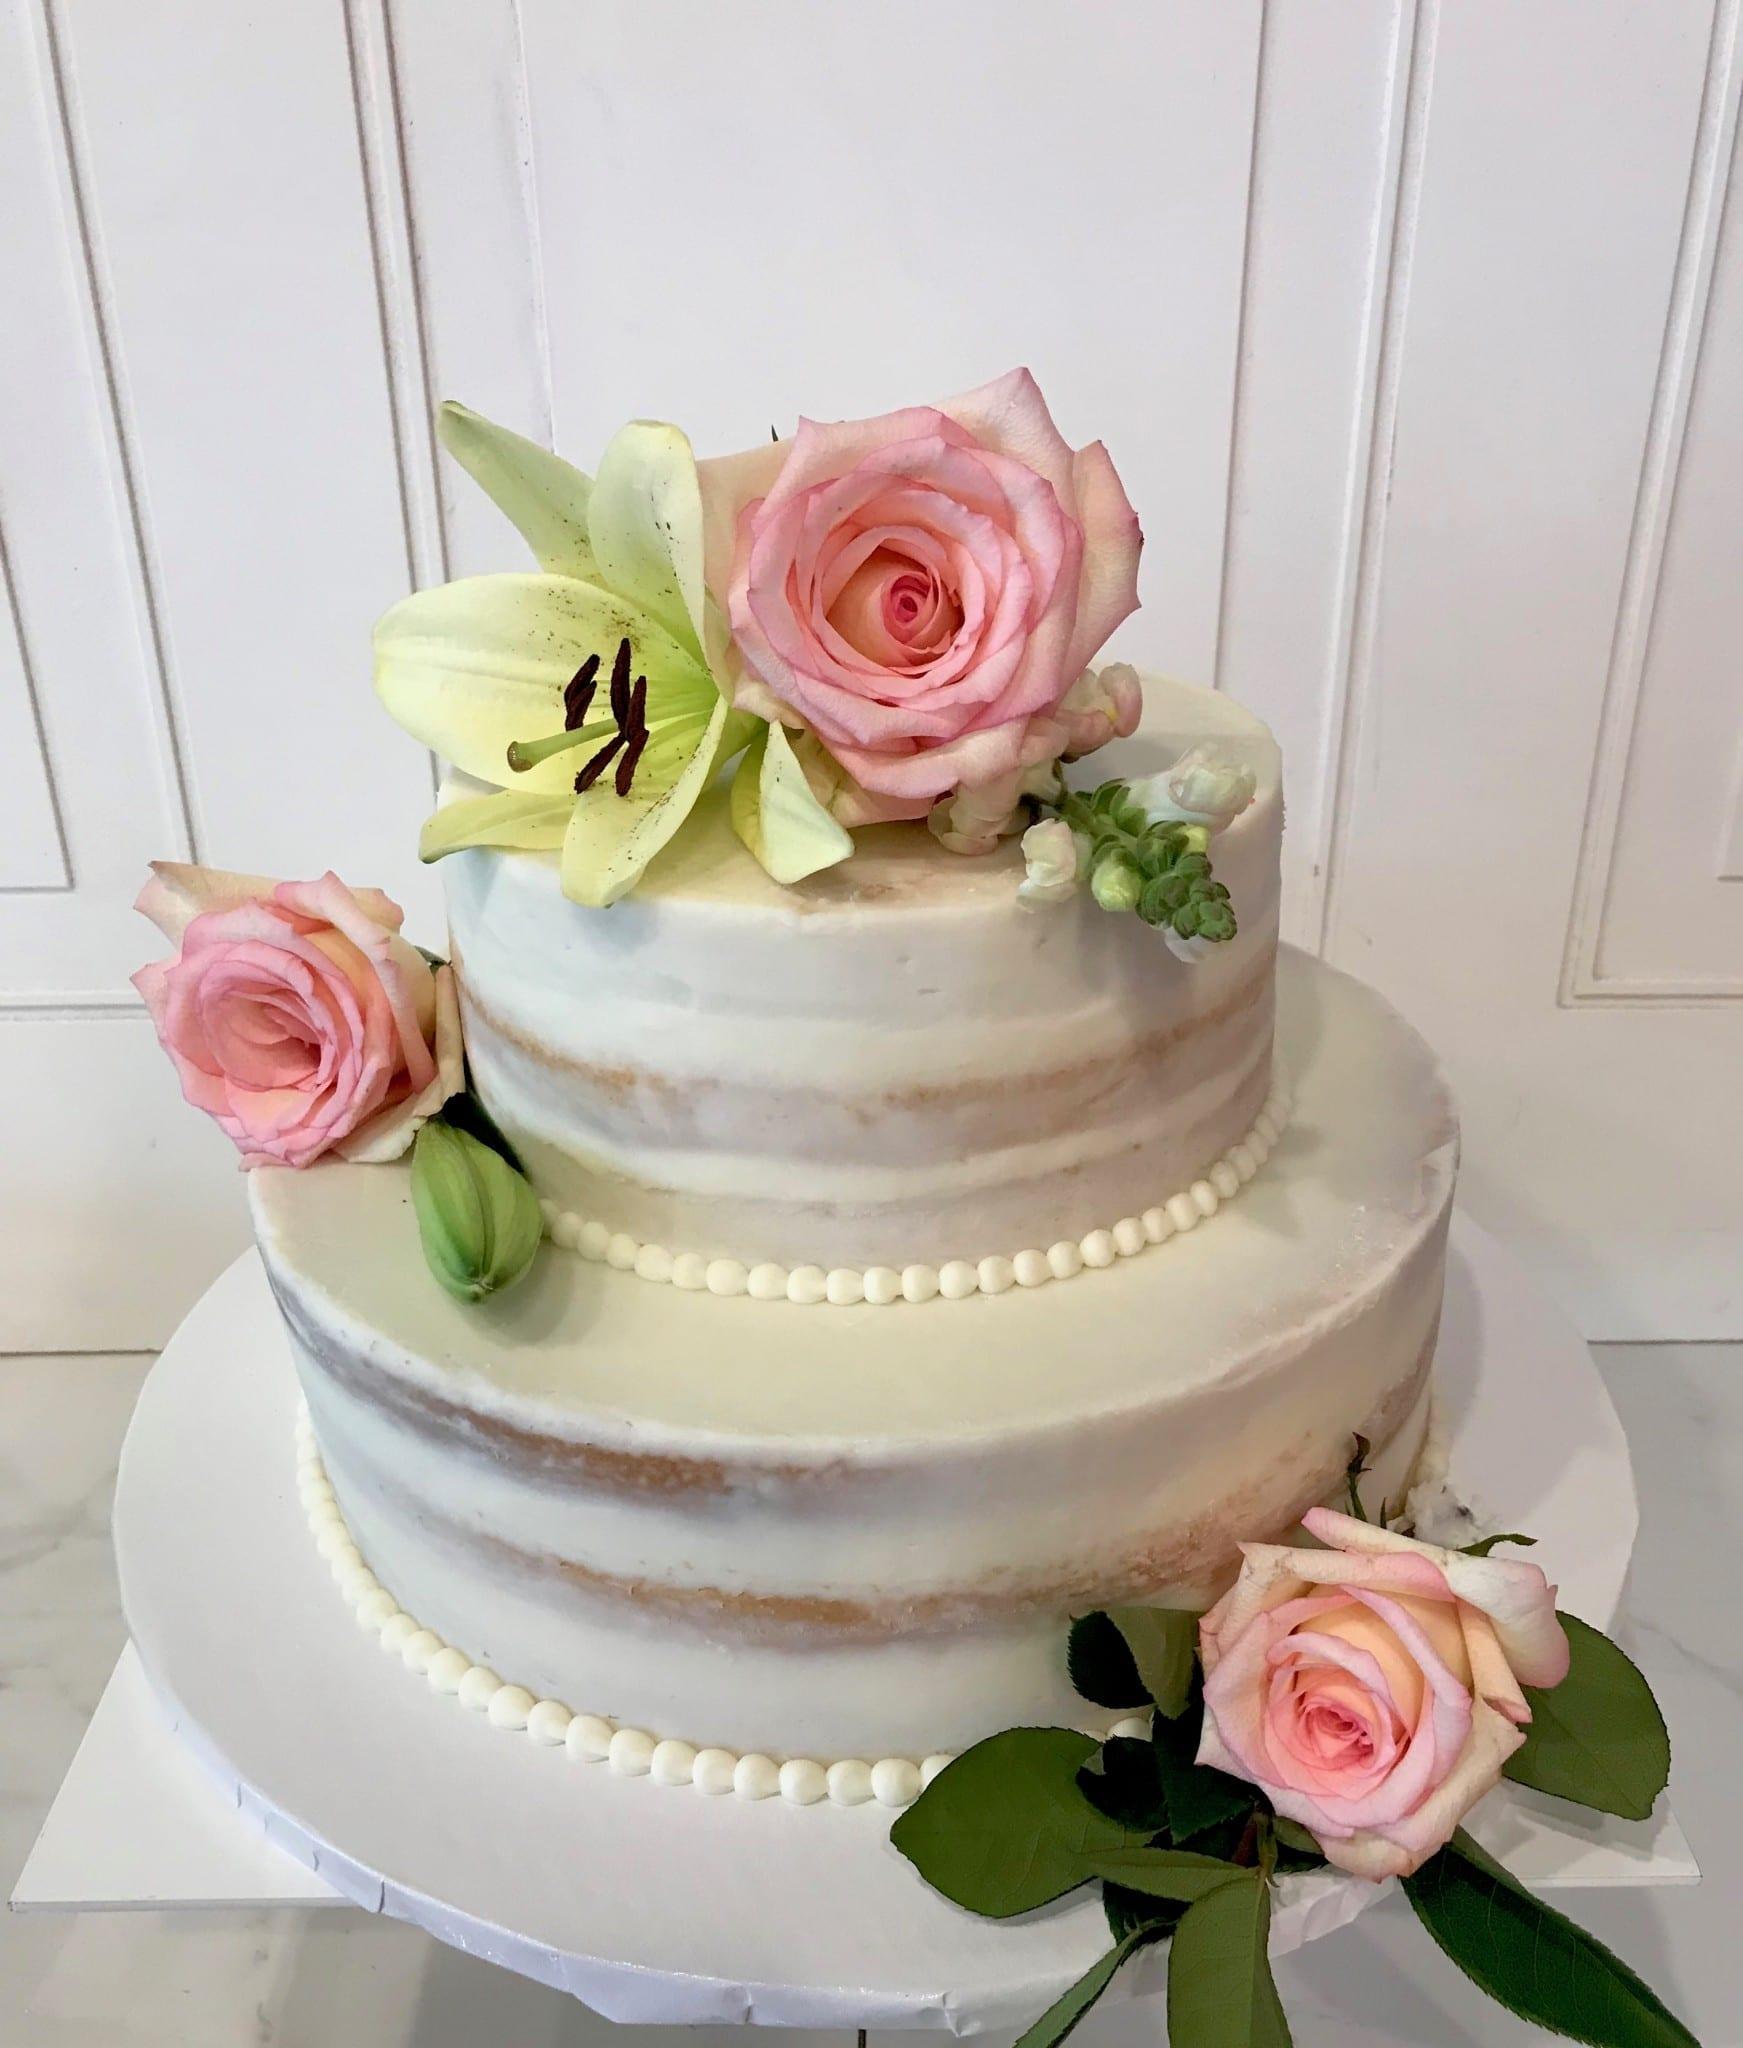 Naked Wedding Cake with Pink Roses   3 Sweet Girls Cakery